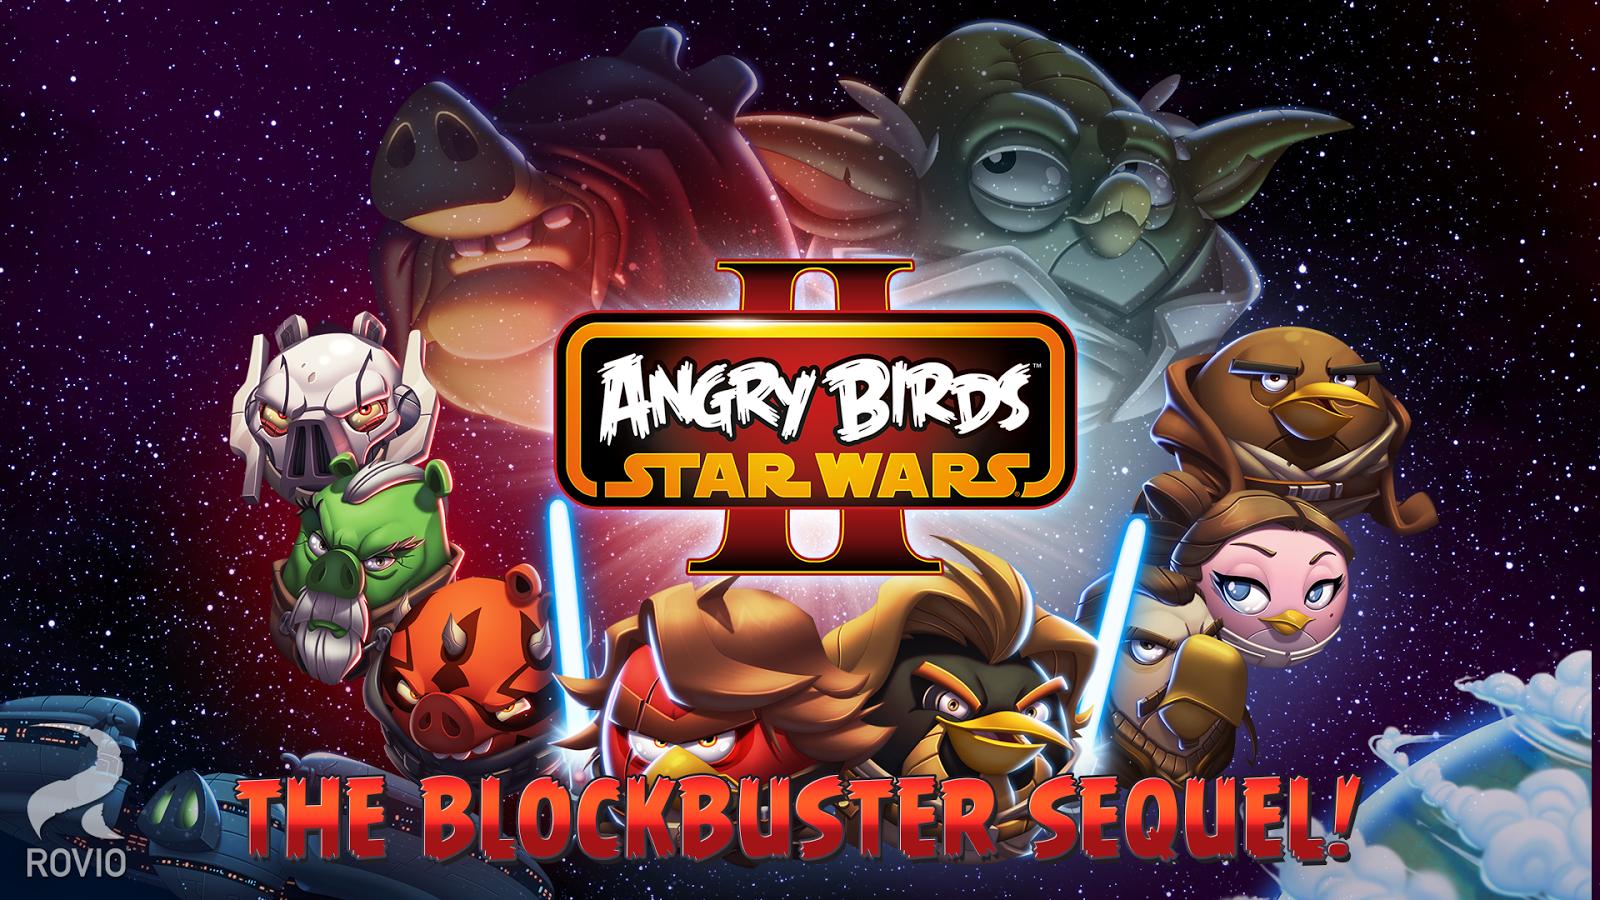 angry birds star wars 2 serial key pc